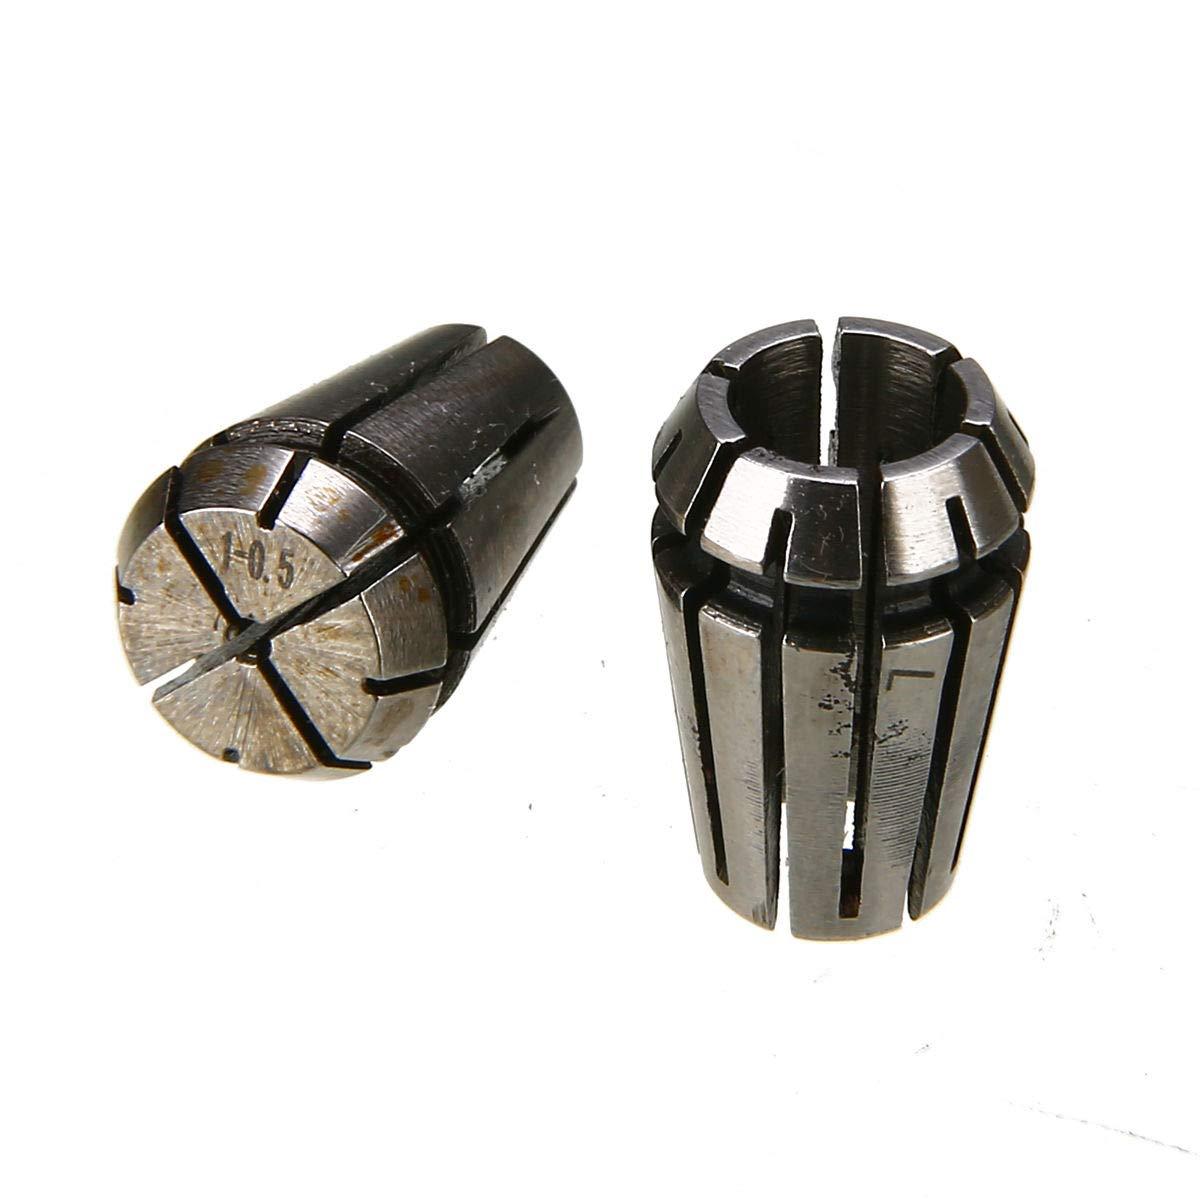 15PCS ER11 Precision Spring Collet For CNC Engraving Machine Milling Lathe Tool